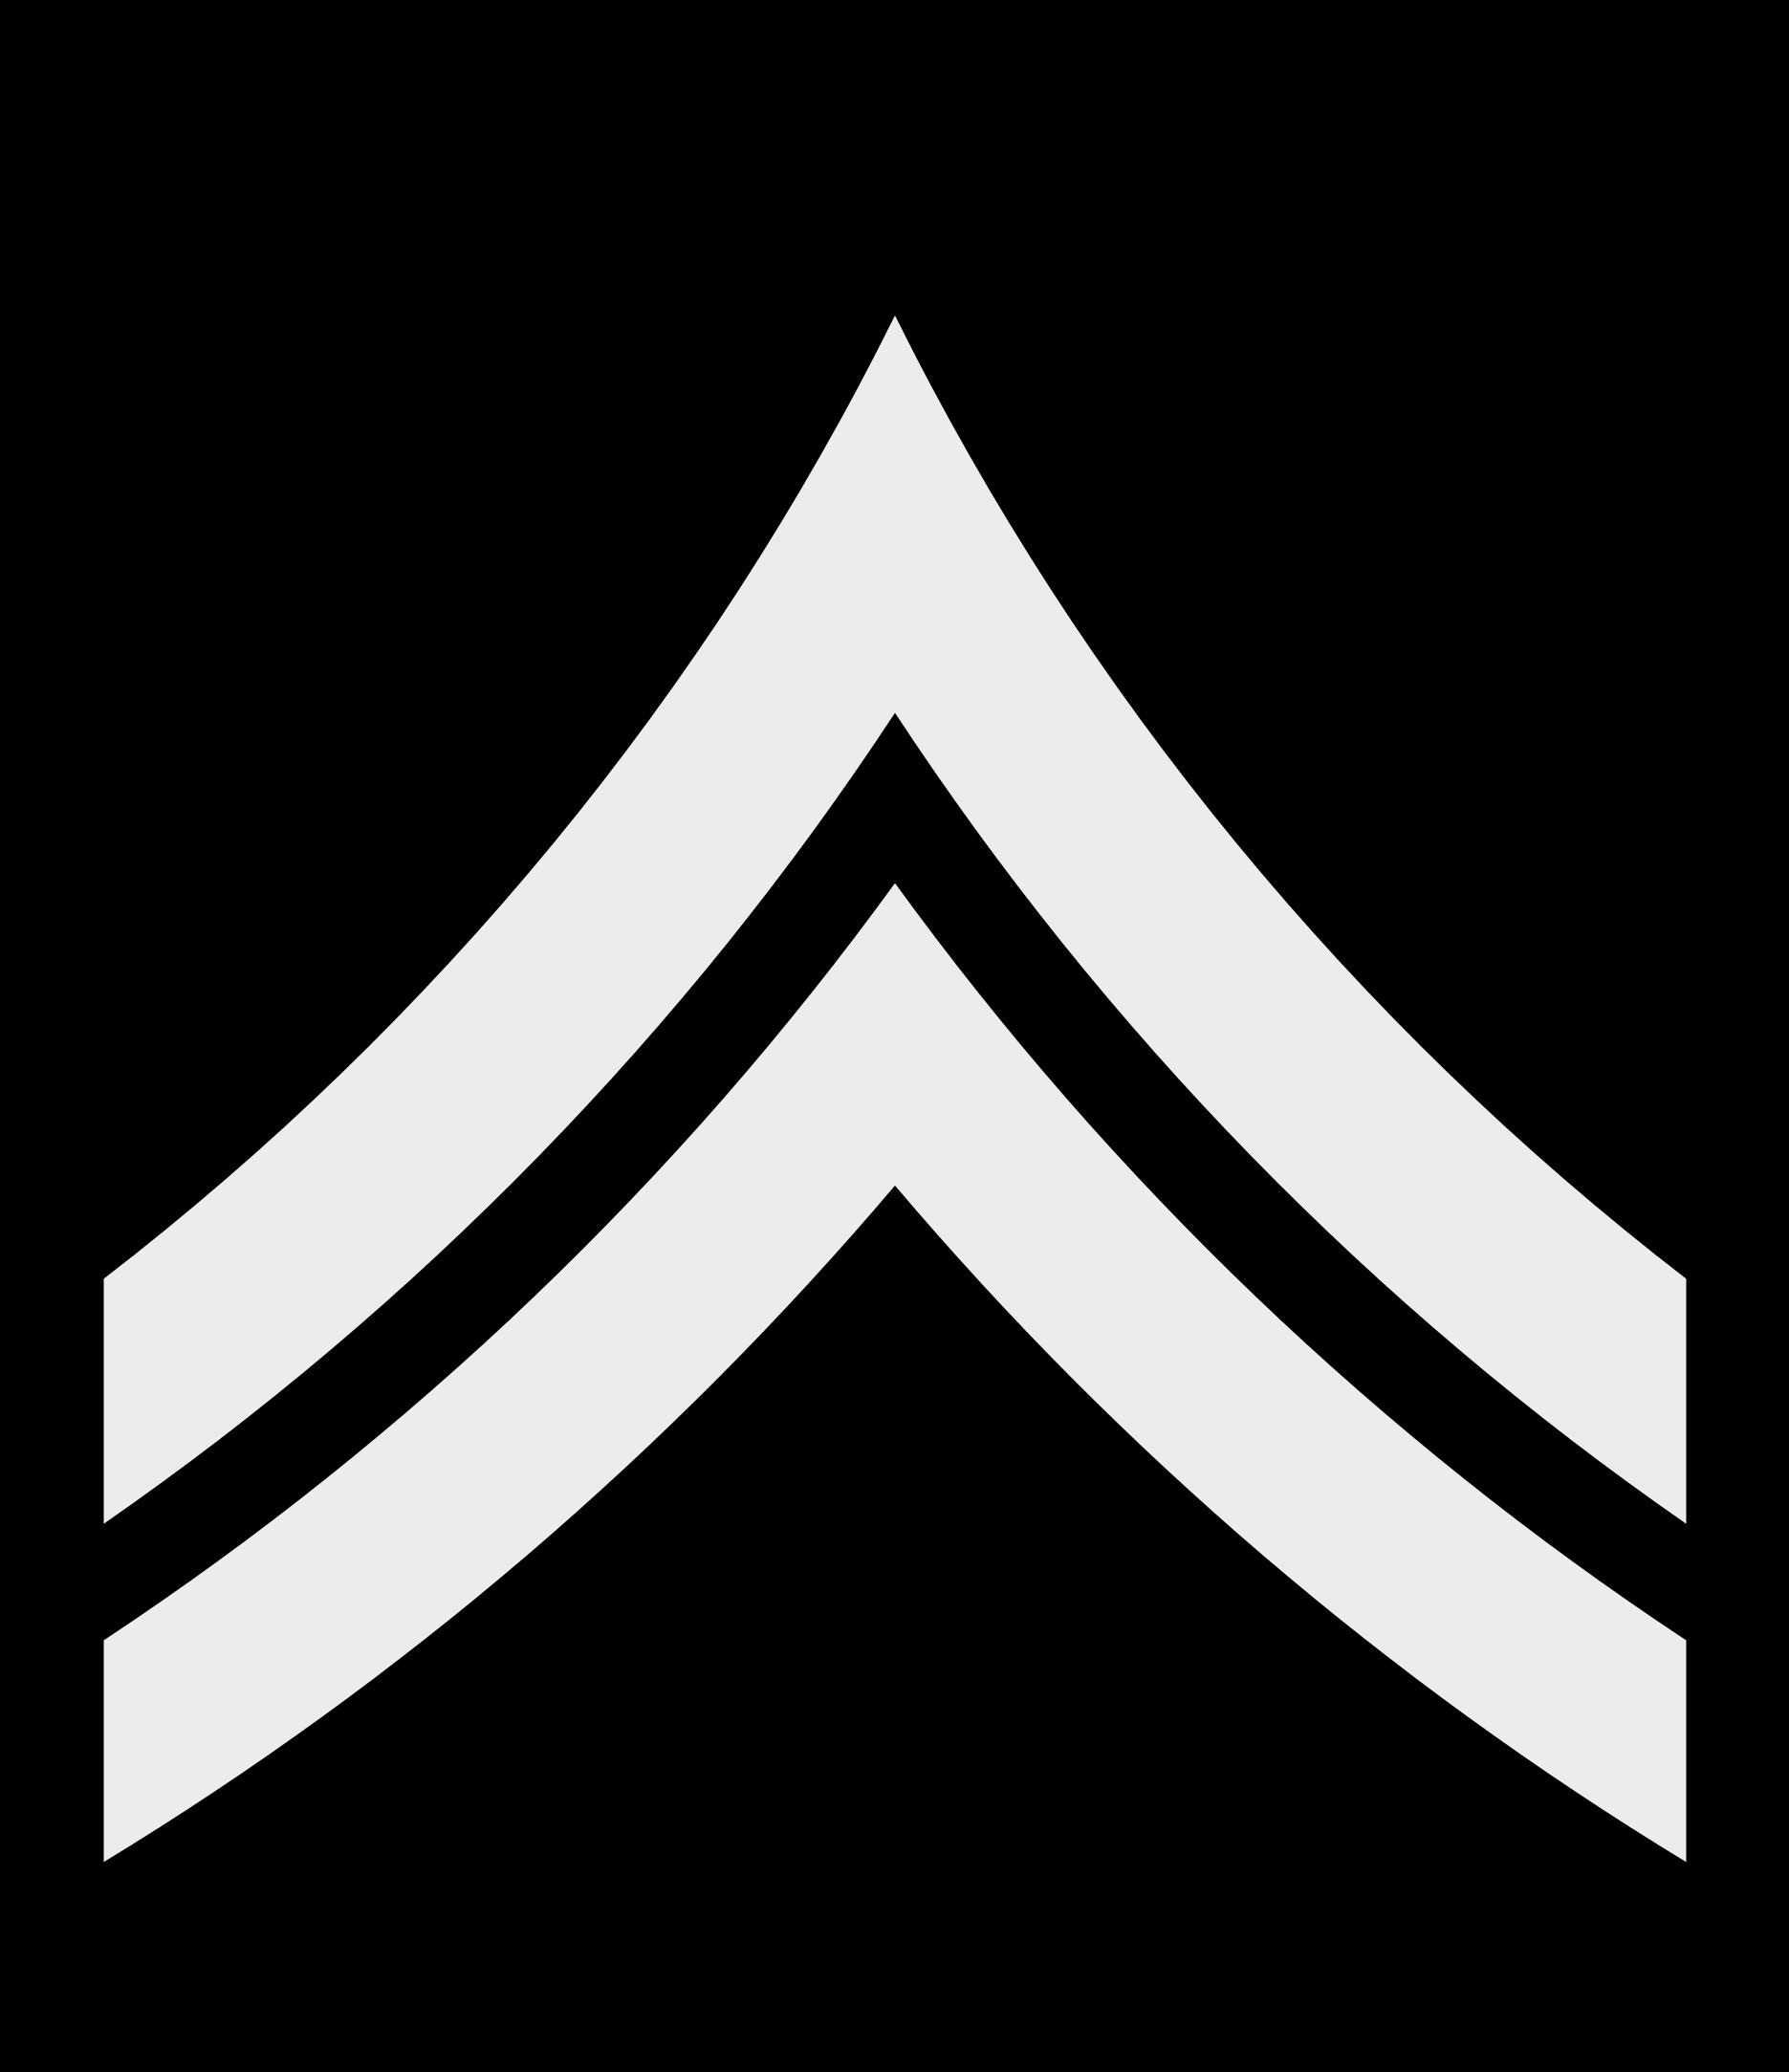 Highway patrol clipart jpg black and white stock Patrol Clipart Highway Patrol - Sergeant Stripes - Download ... jpg black and white stock